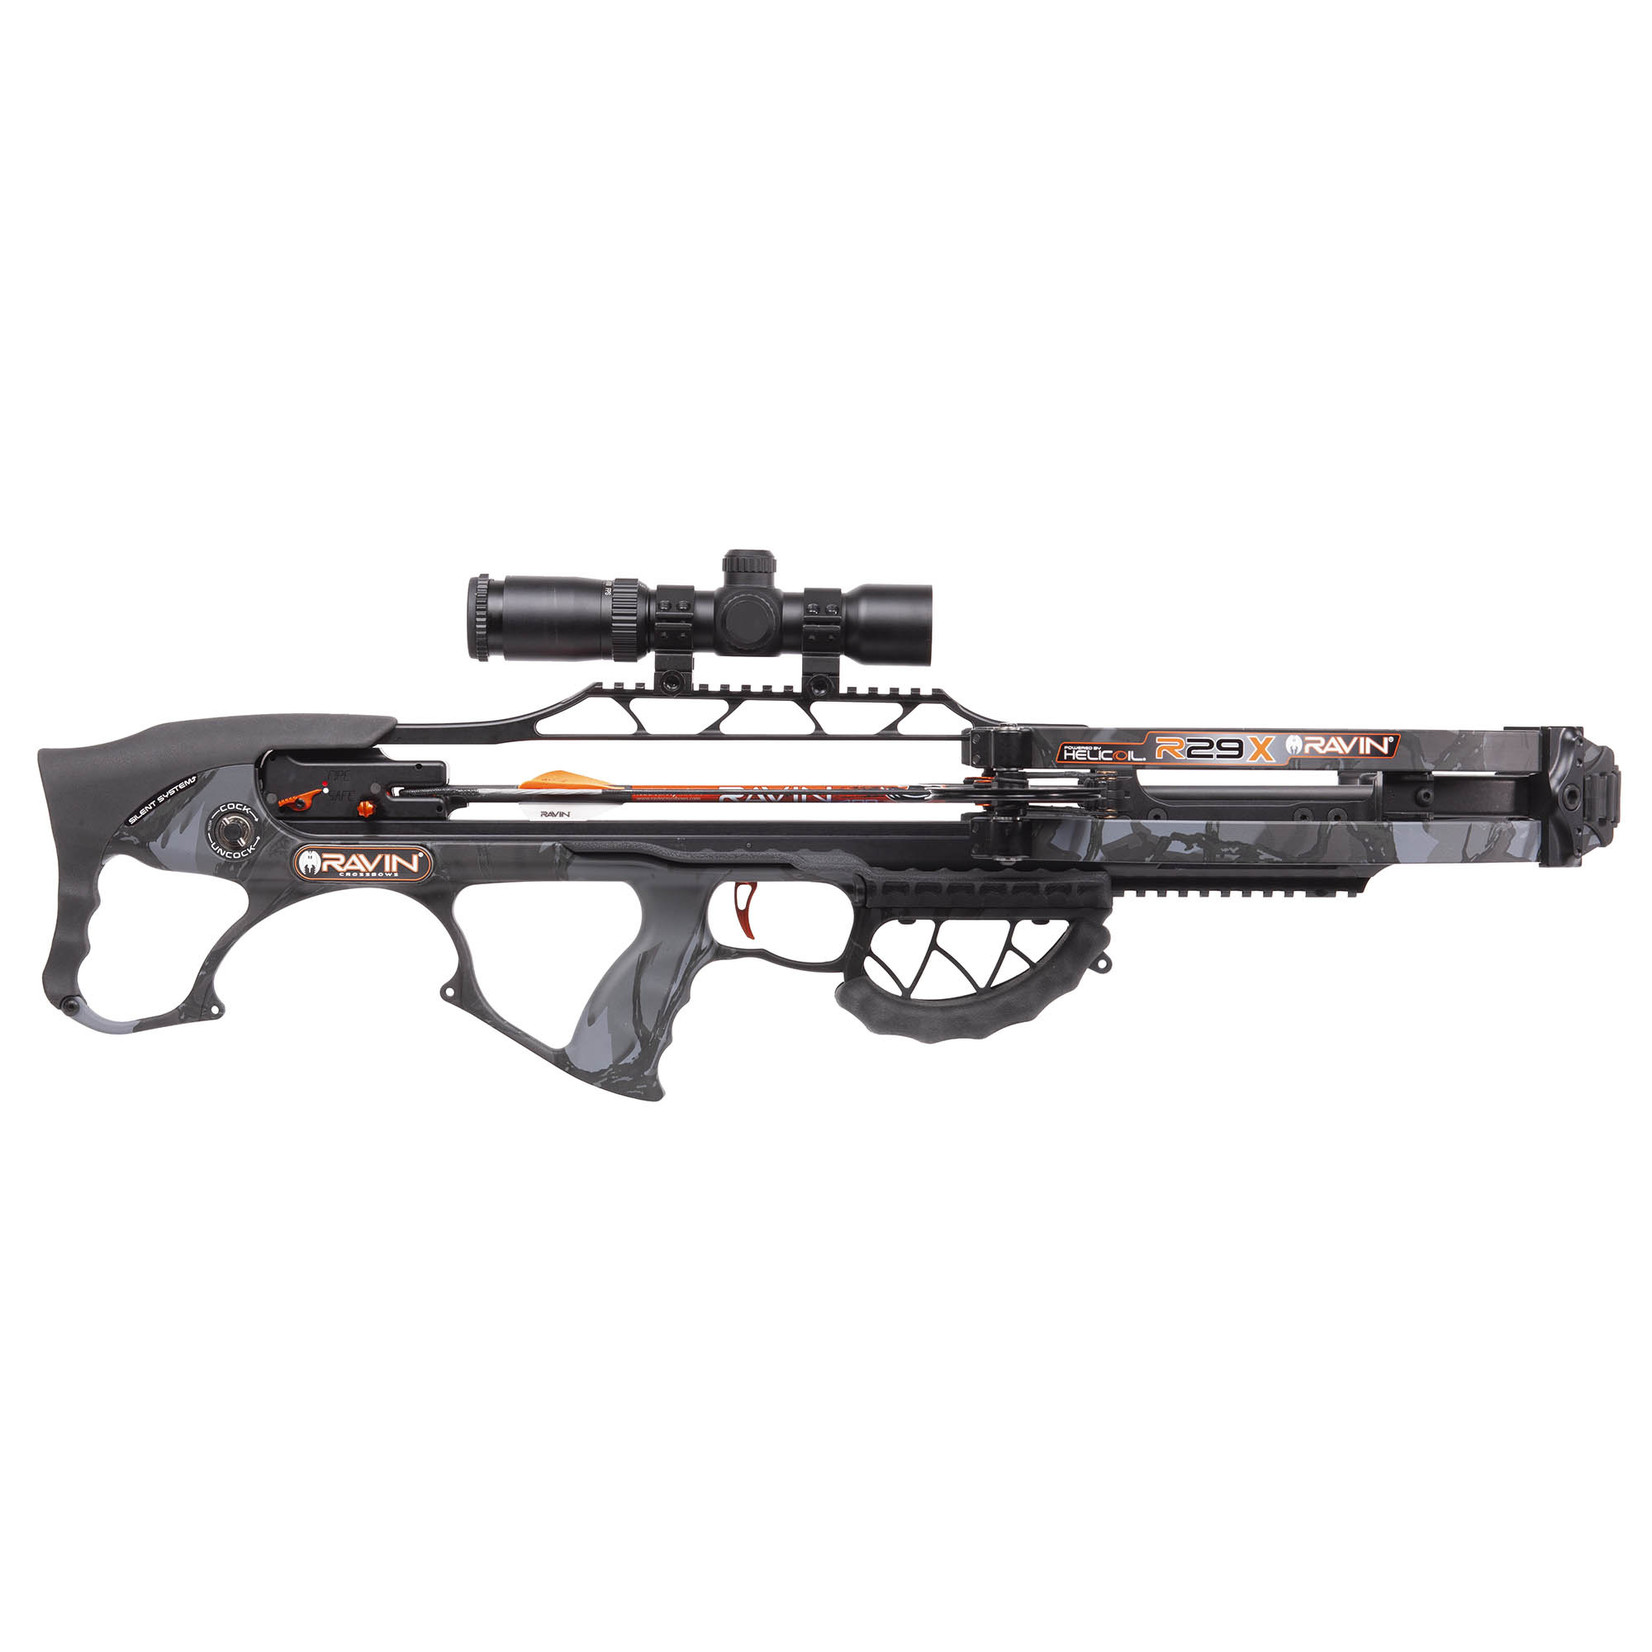 Ravin Ravin R29X Crossbow